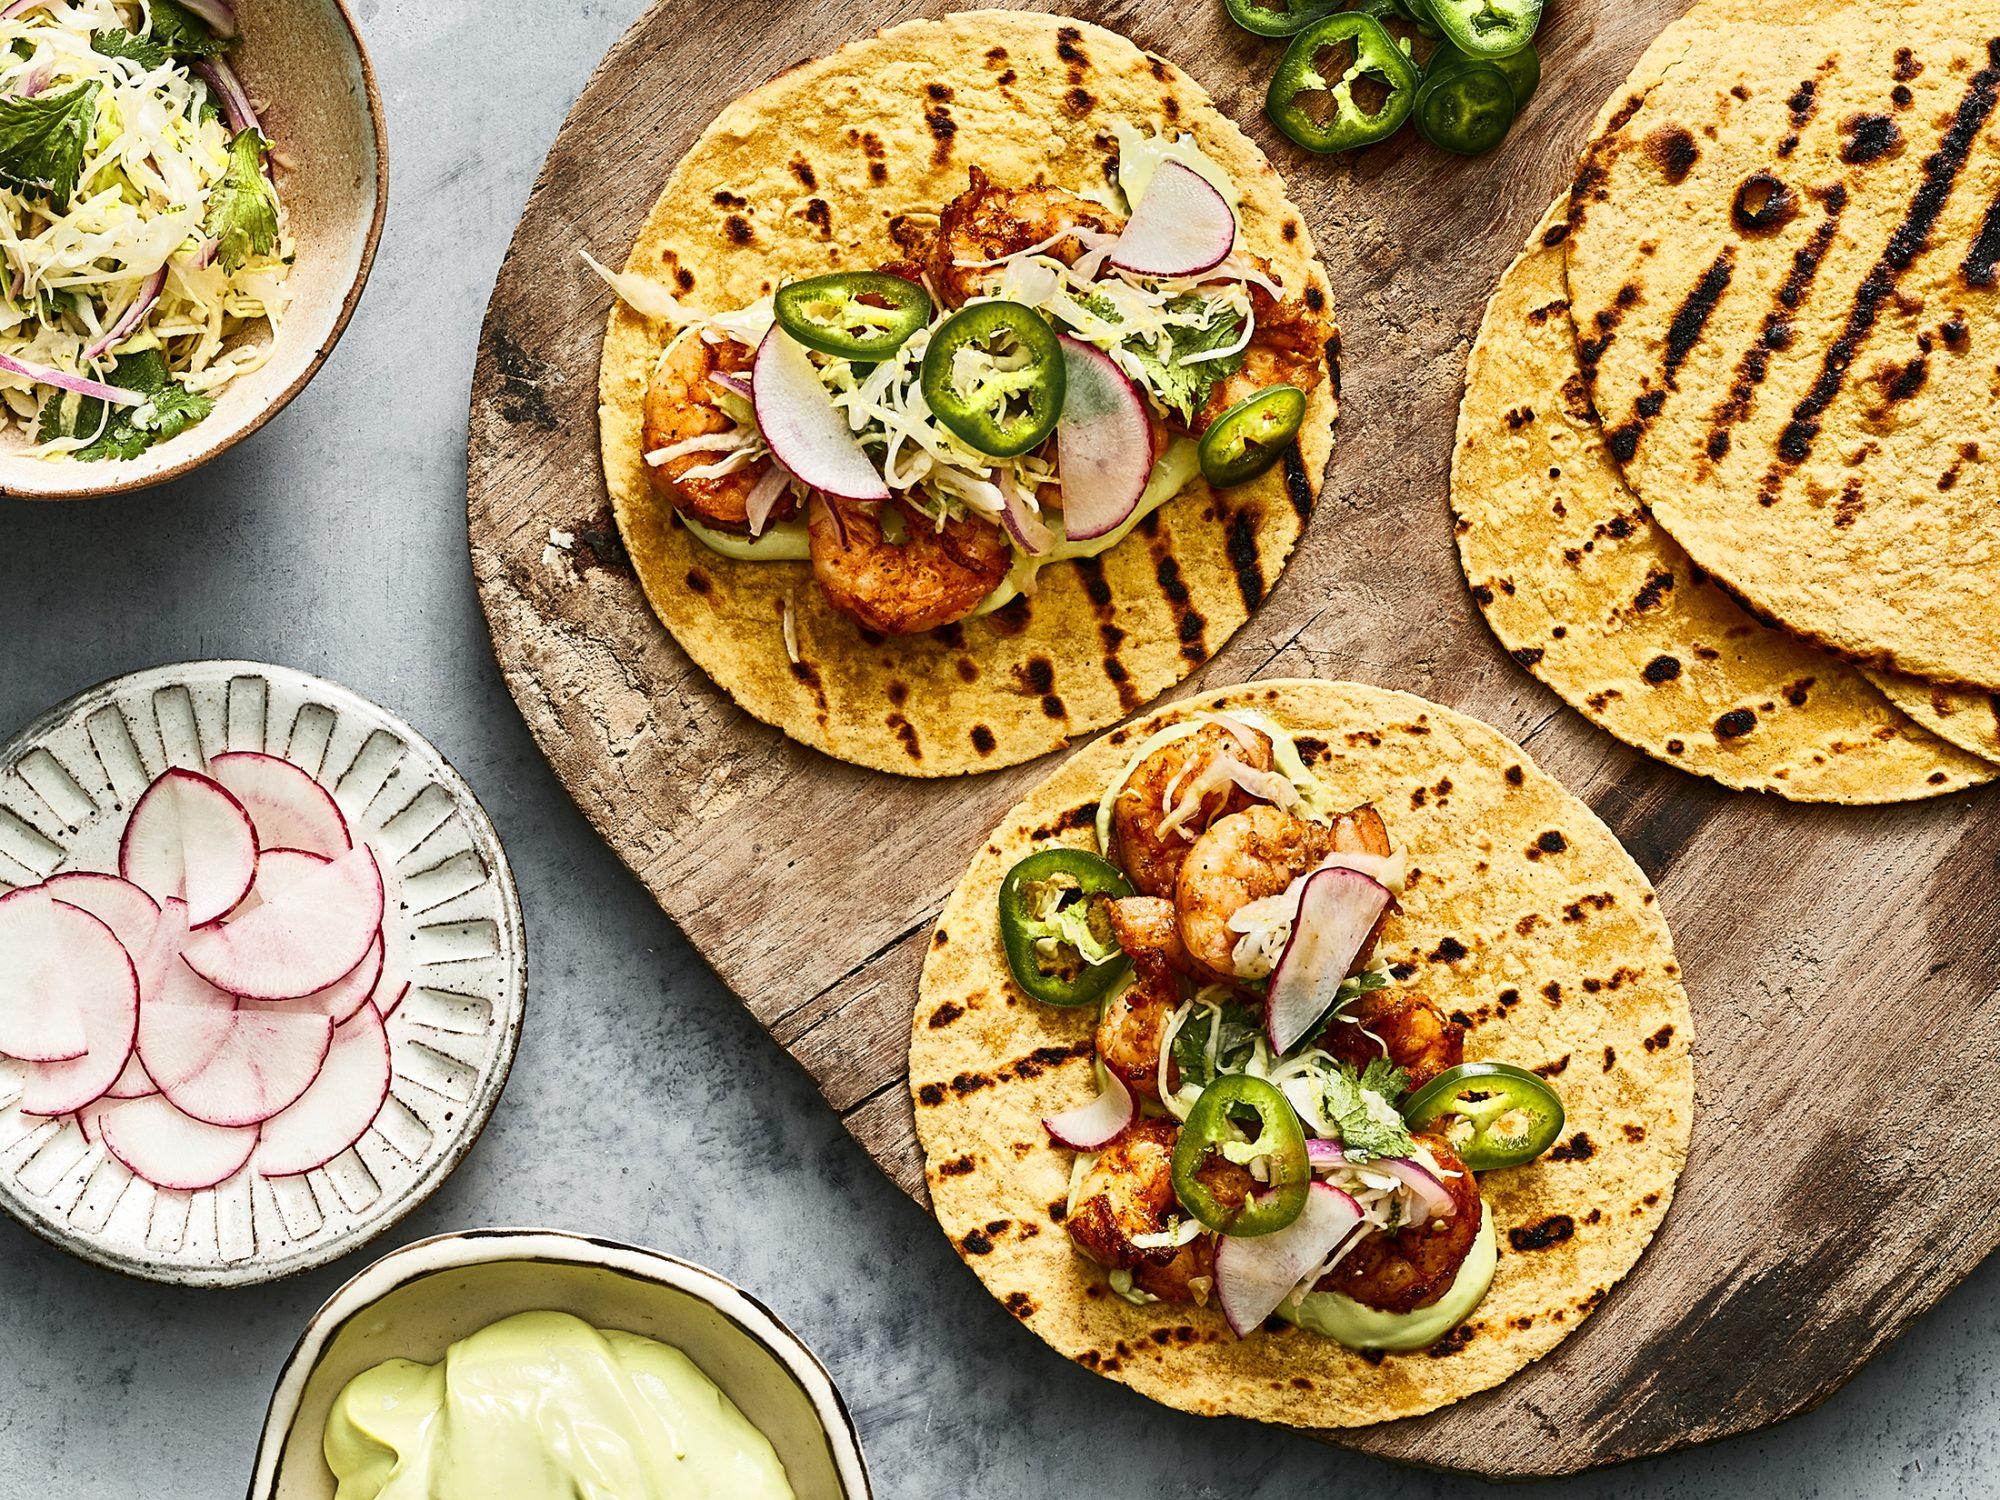 Shrimp Tacos with Cilantro-Lime Slaw